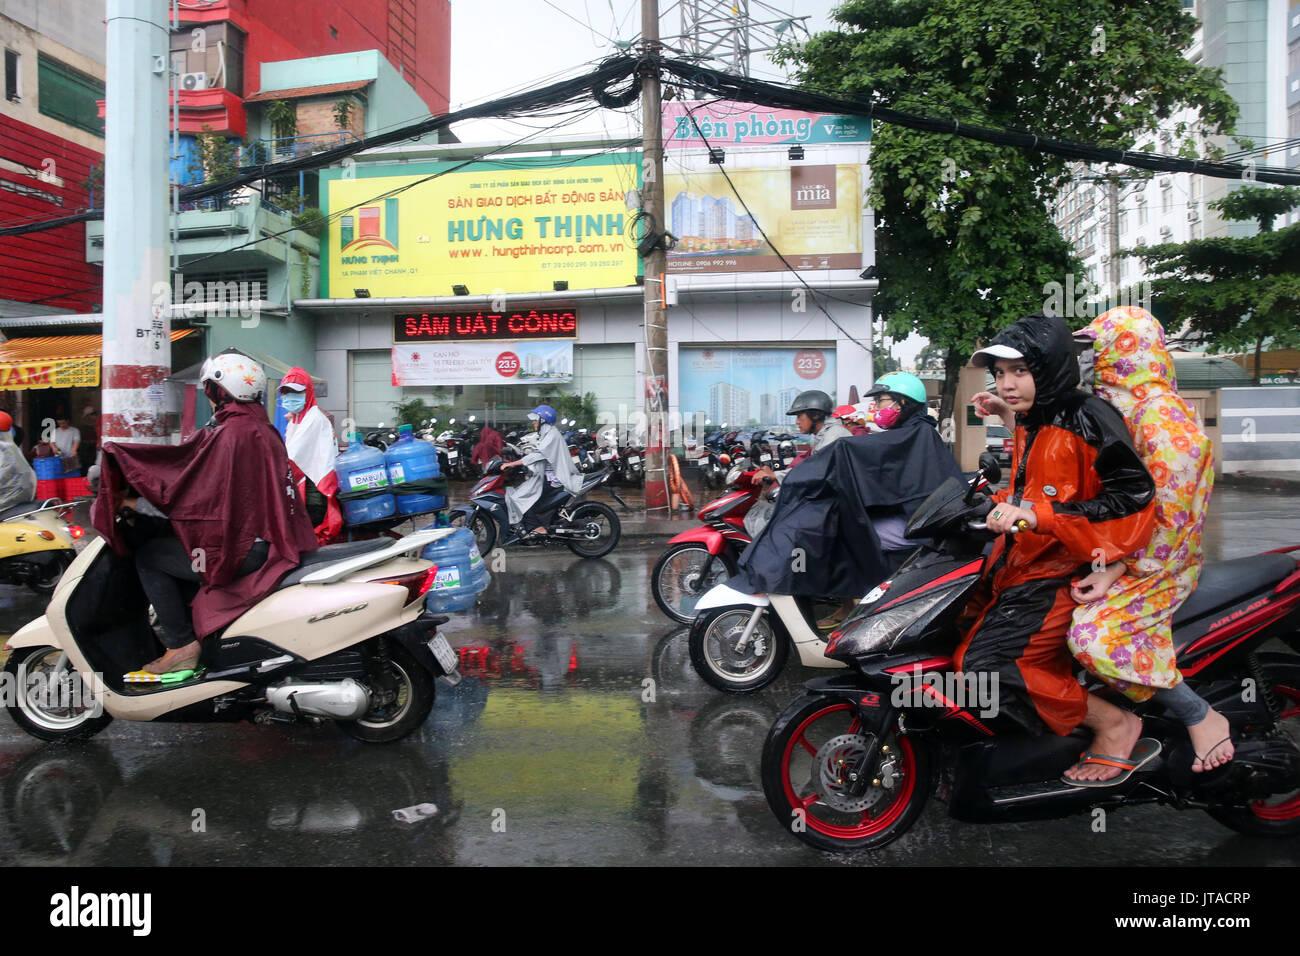 Motor scooters on Saigon Street in heavy monsoon rain, Ho Chi Minh City, Vietnam, Indochina, Southeast Asia, Asia - Stock Image